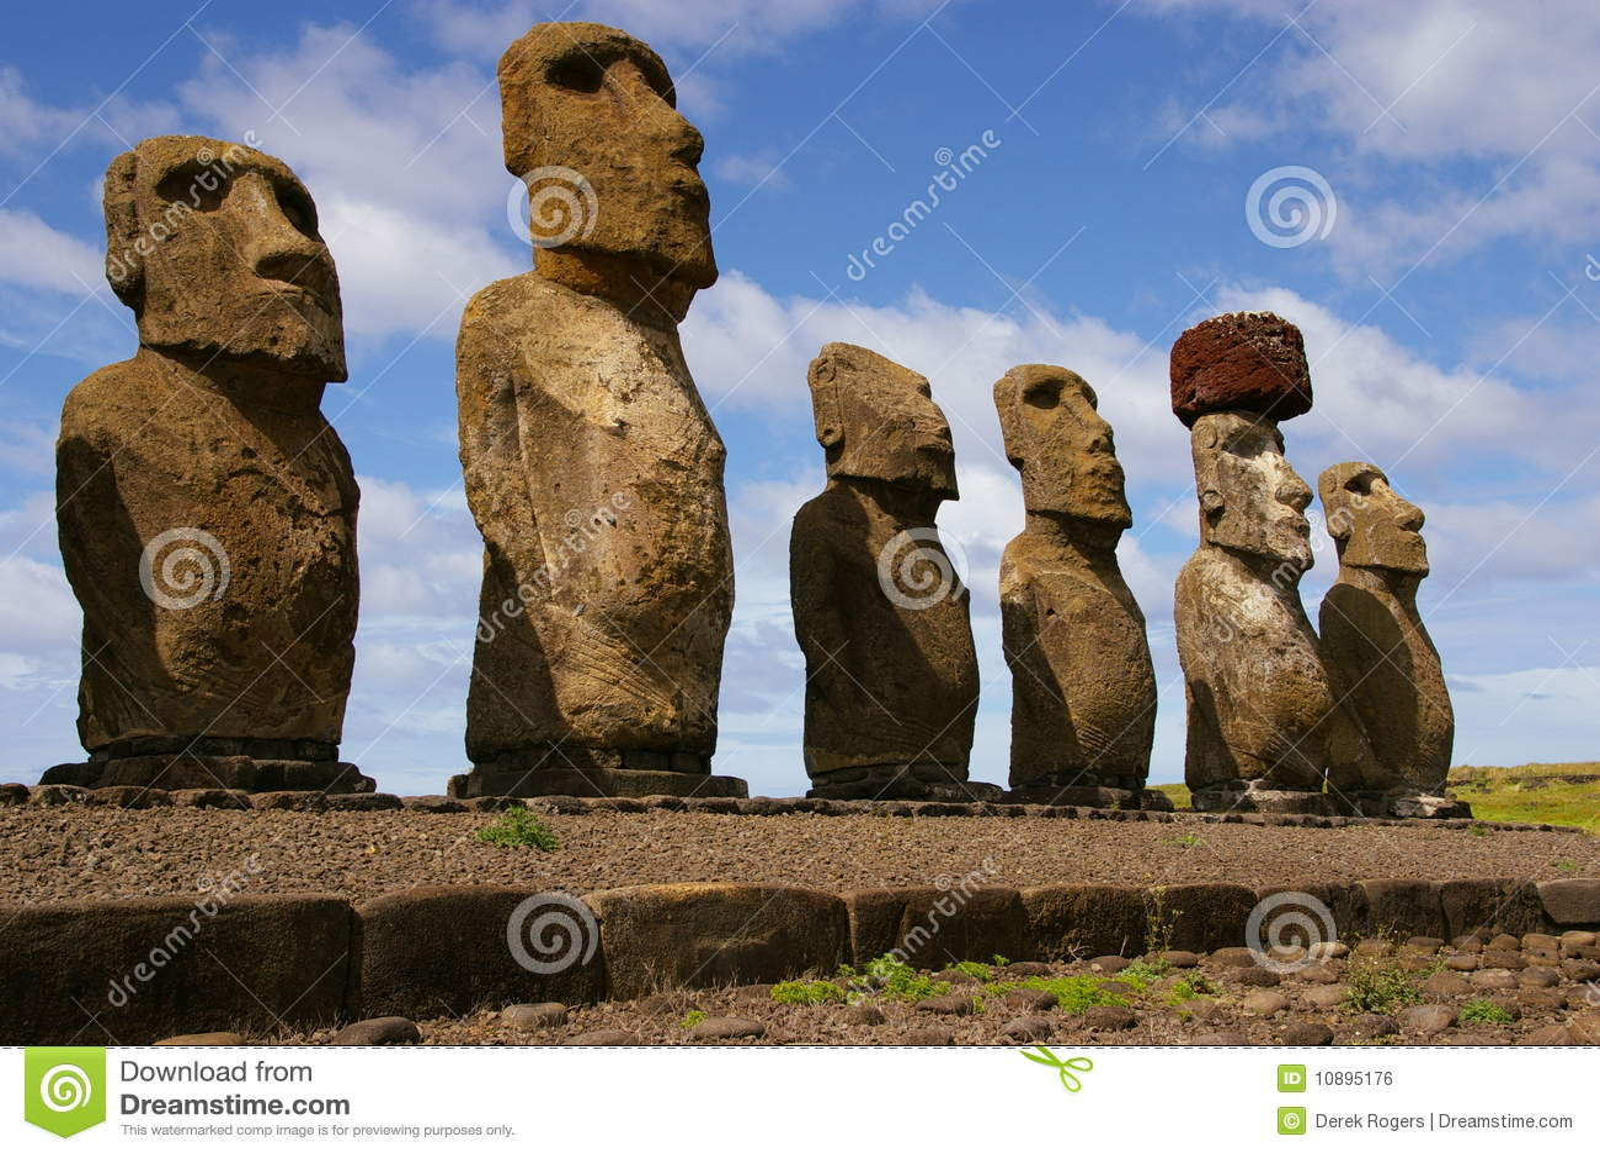 Статуя острова пасхи своими руками 50